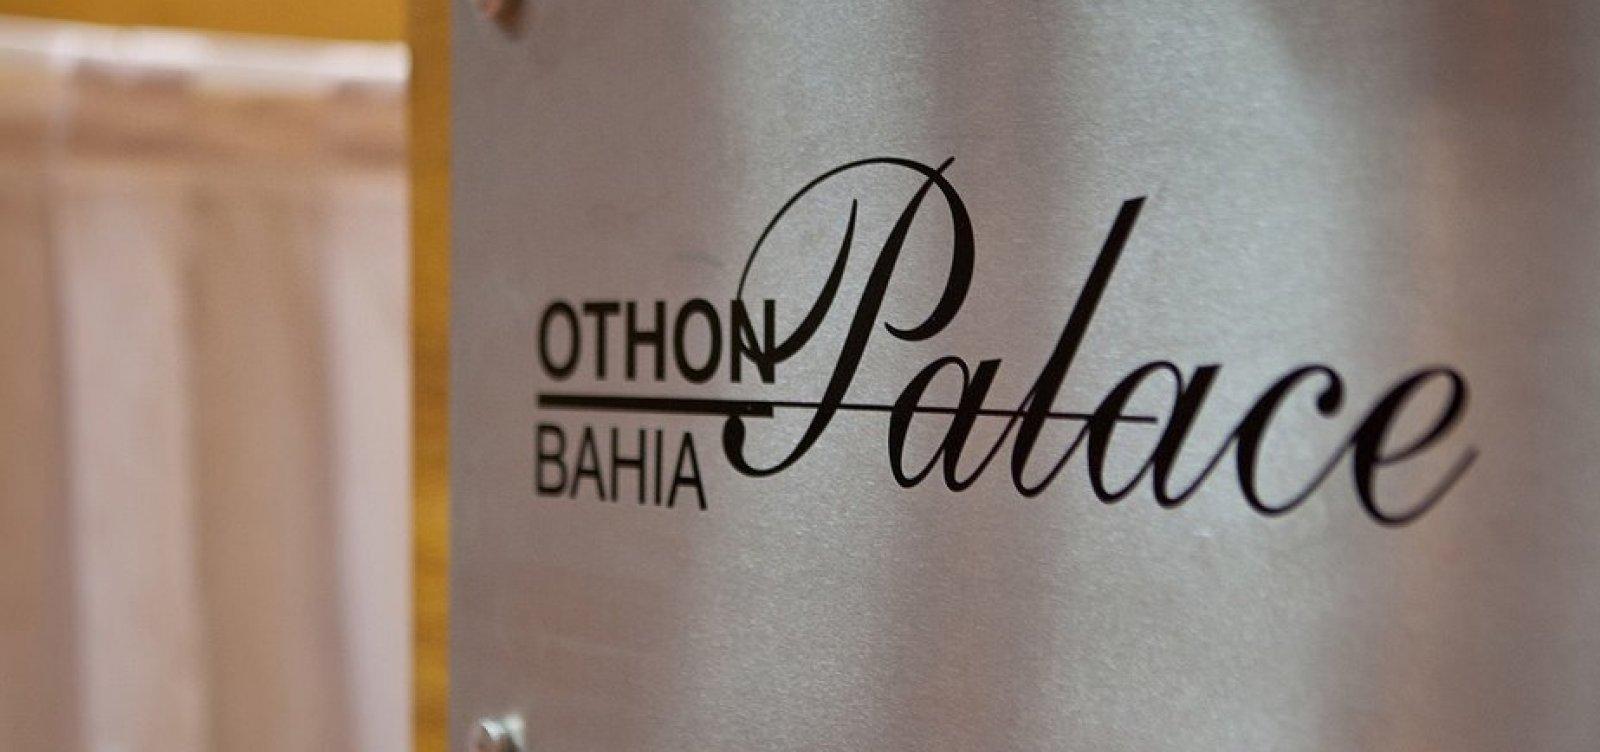 [Othon Bahia demitirá 240 funcionários]